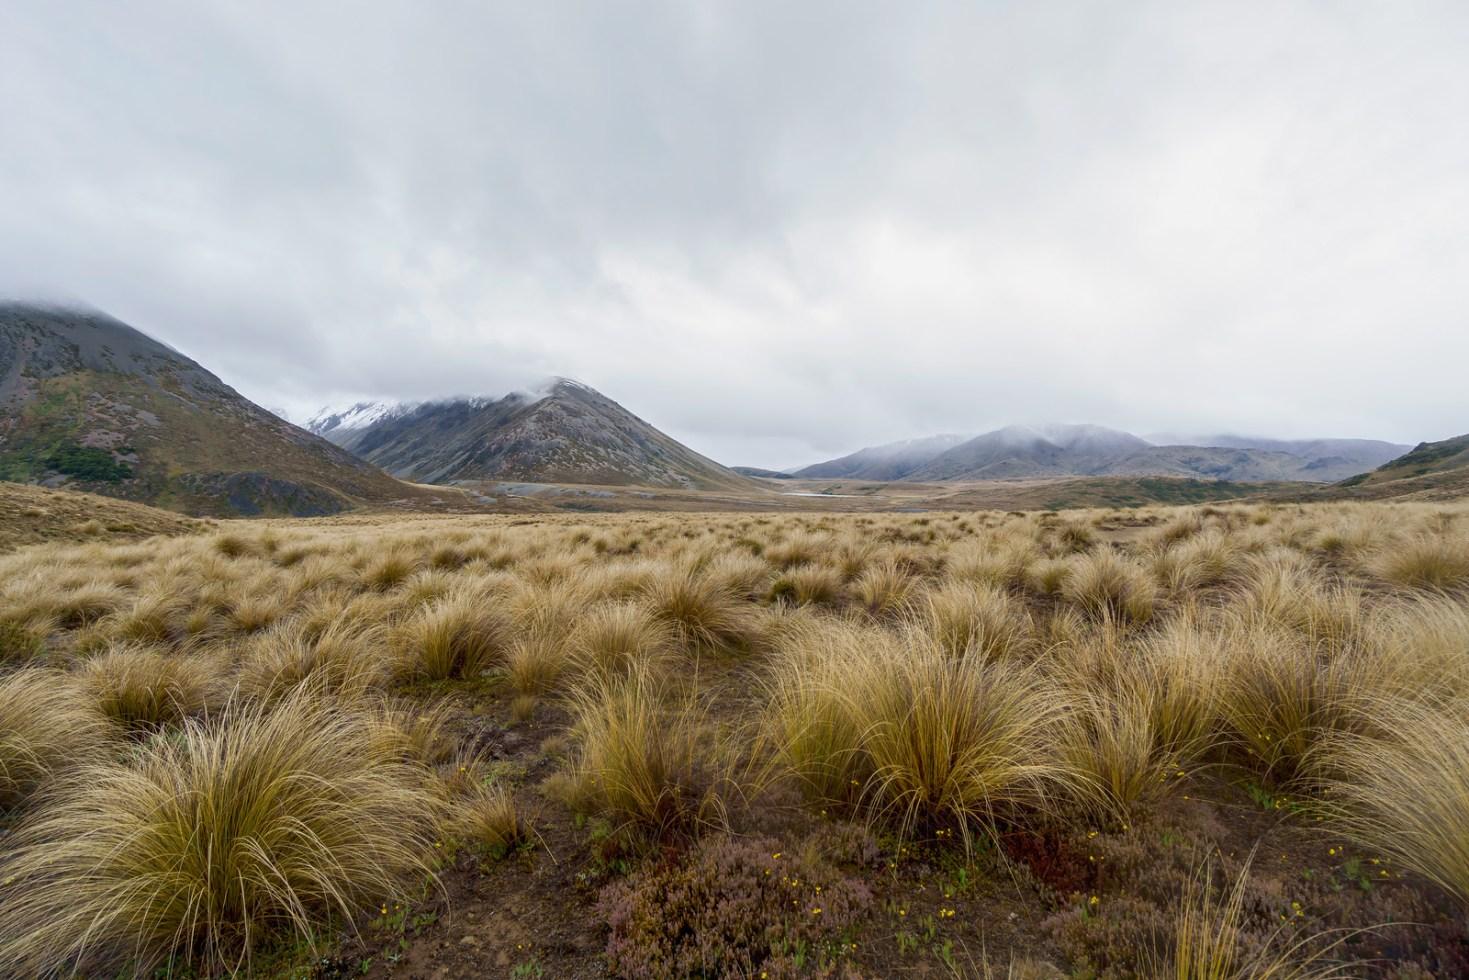 New-Zealand, Saint James Range